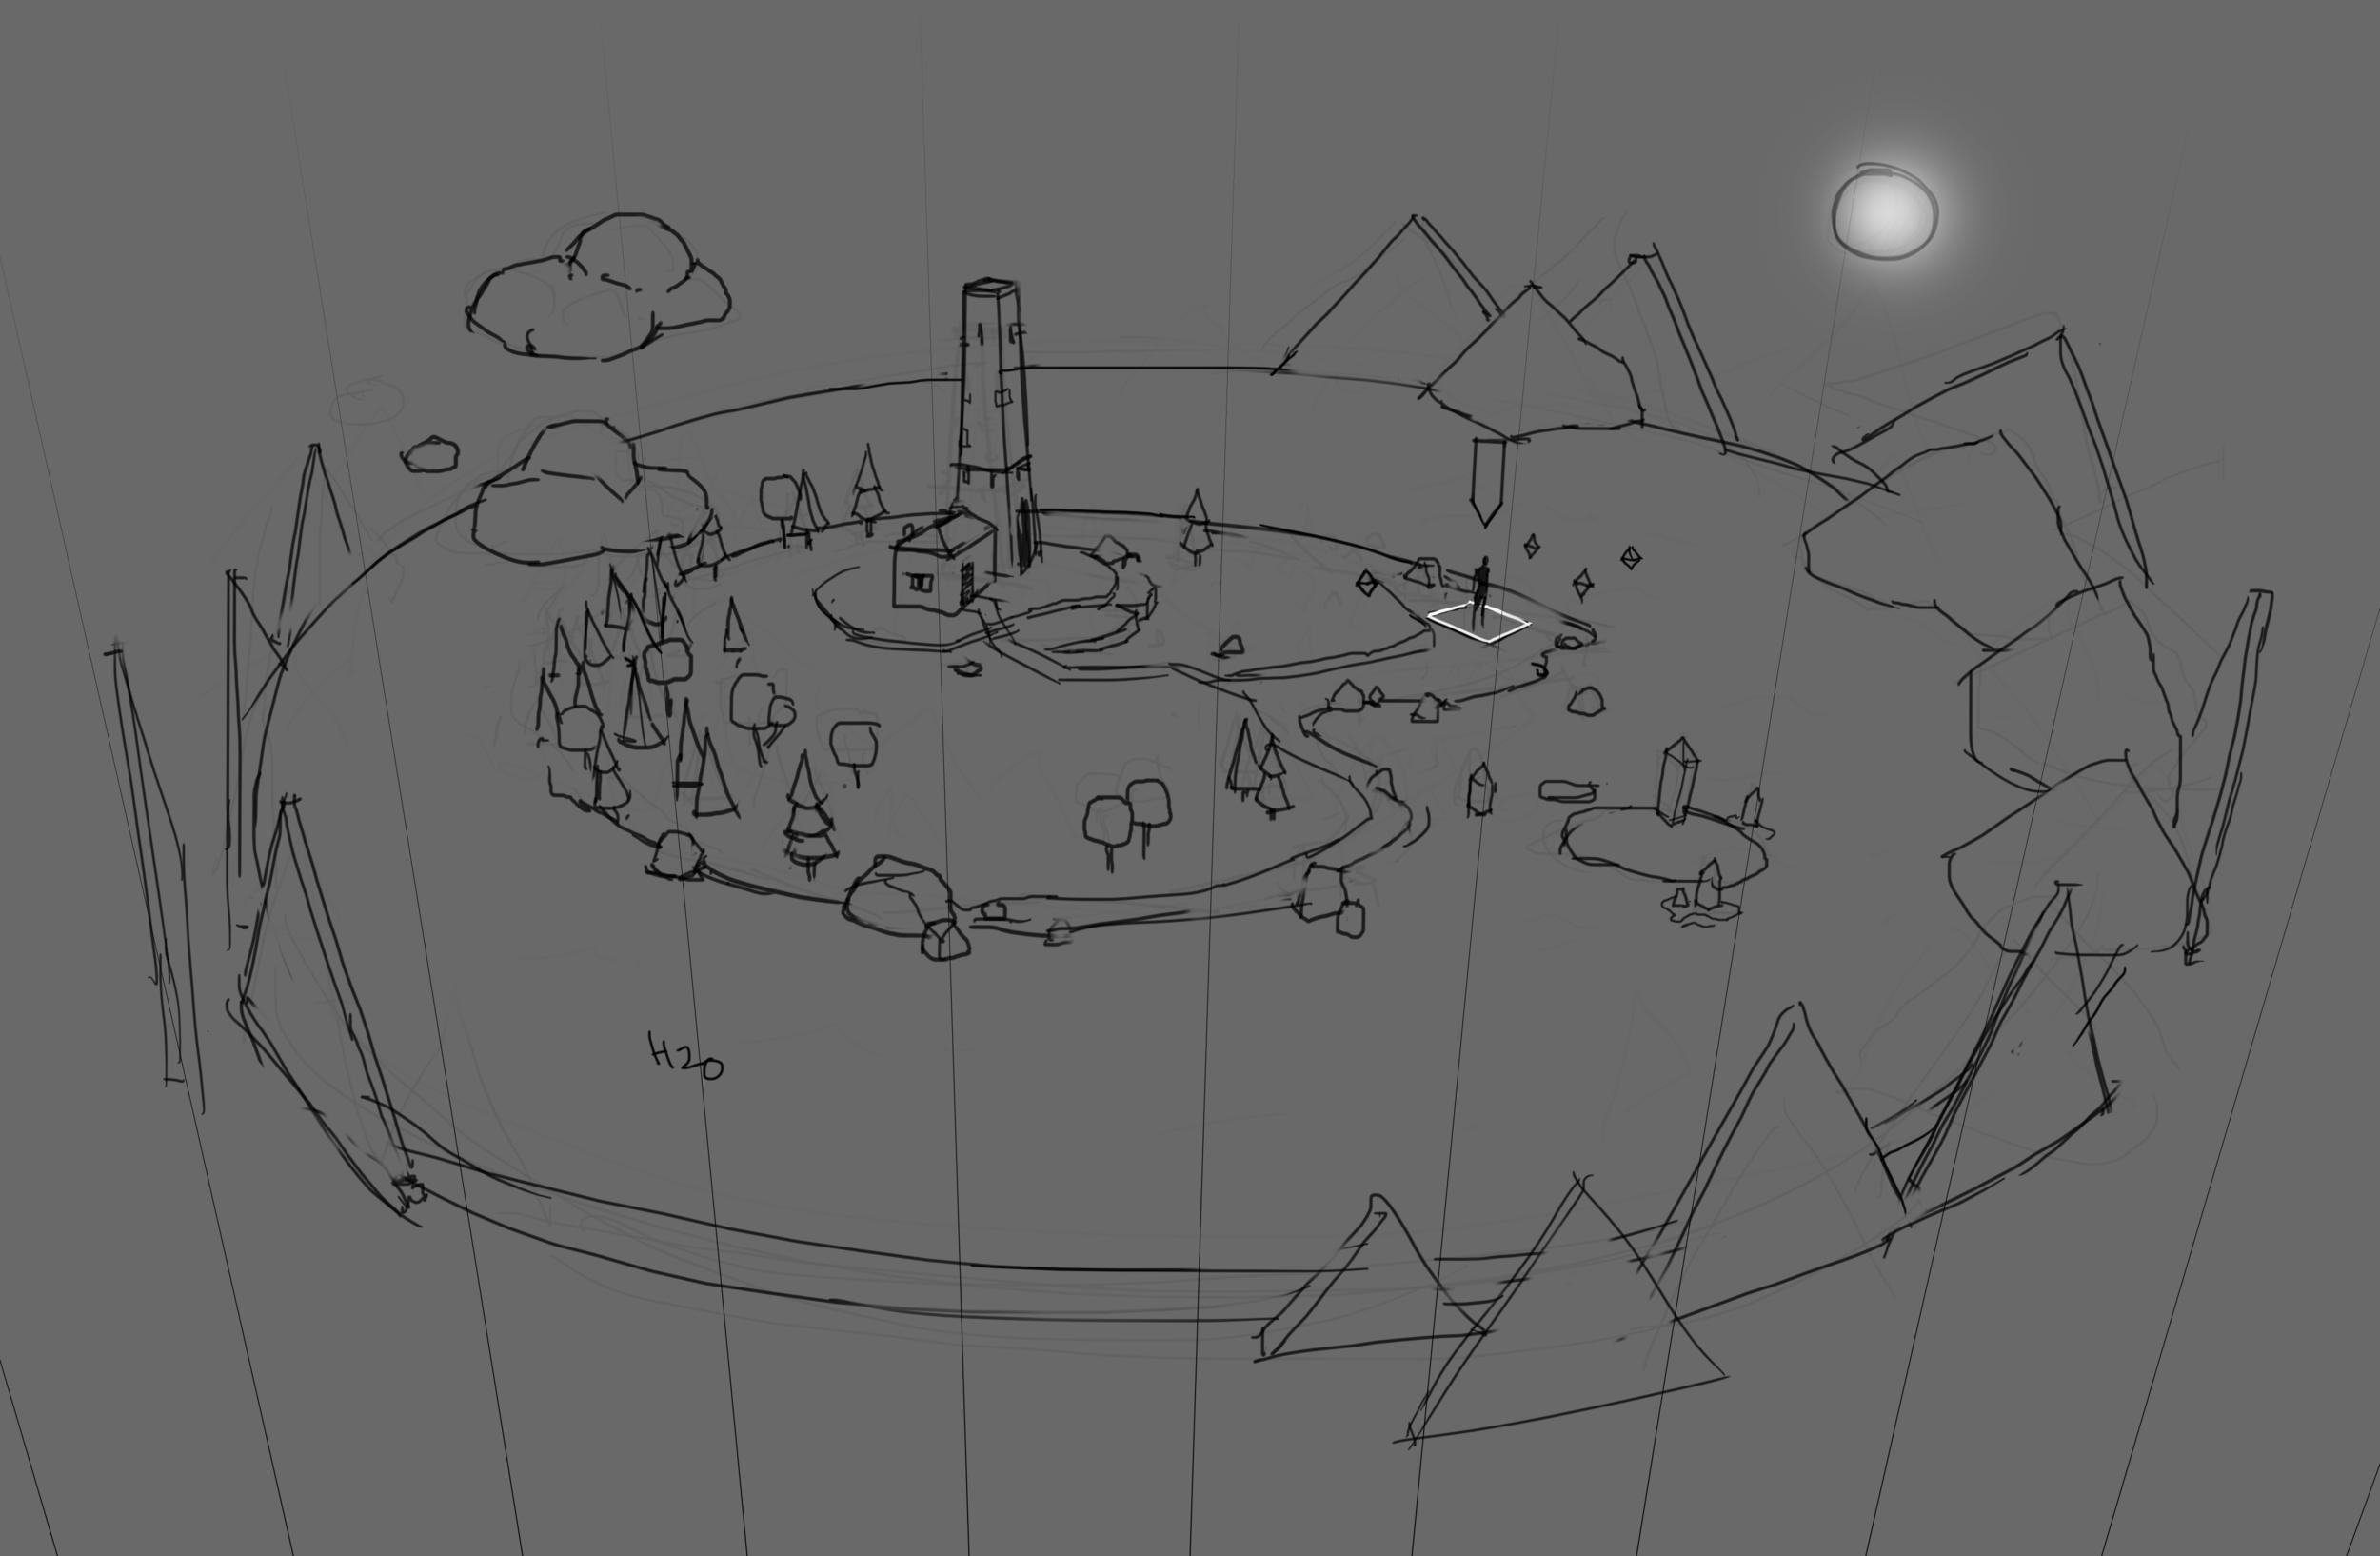 Island_sketch.png